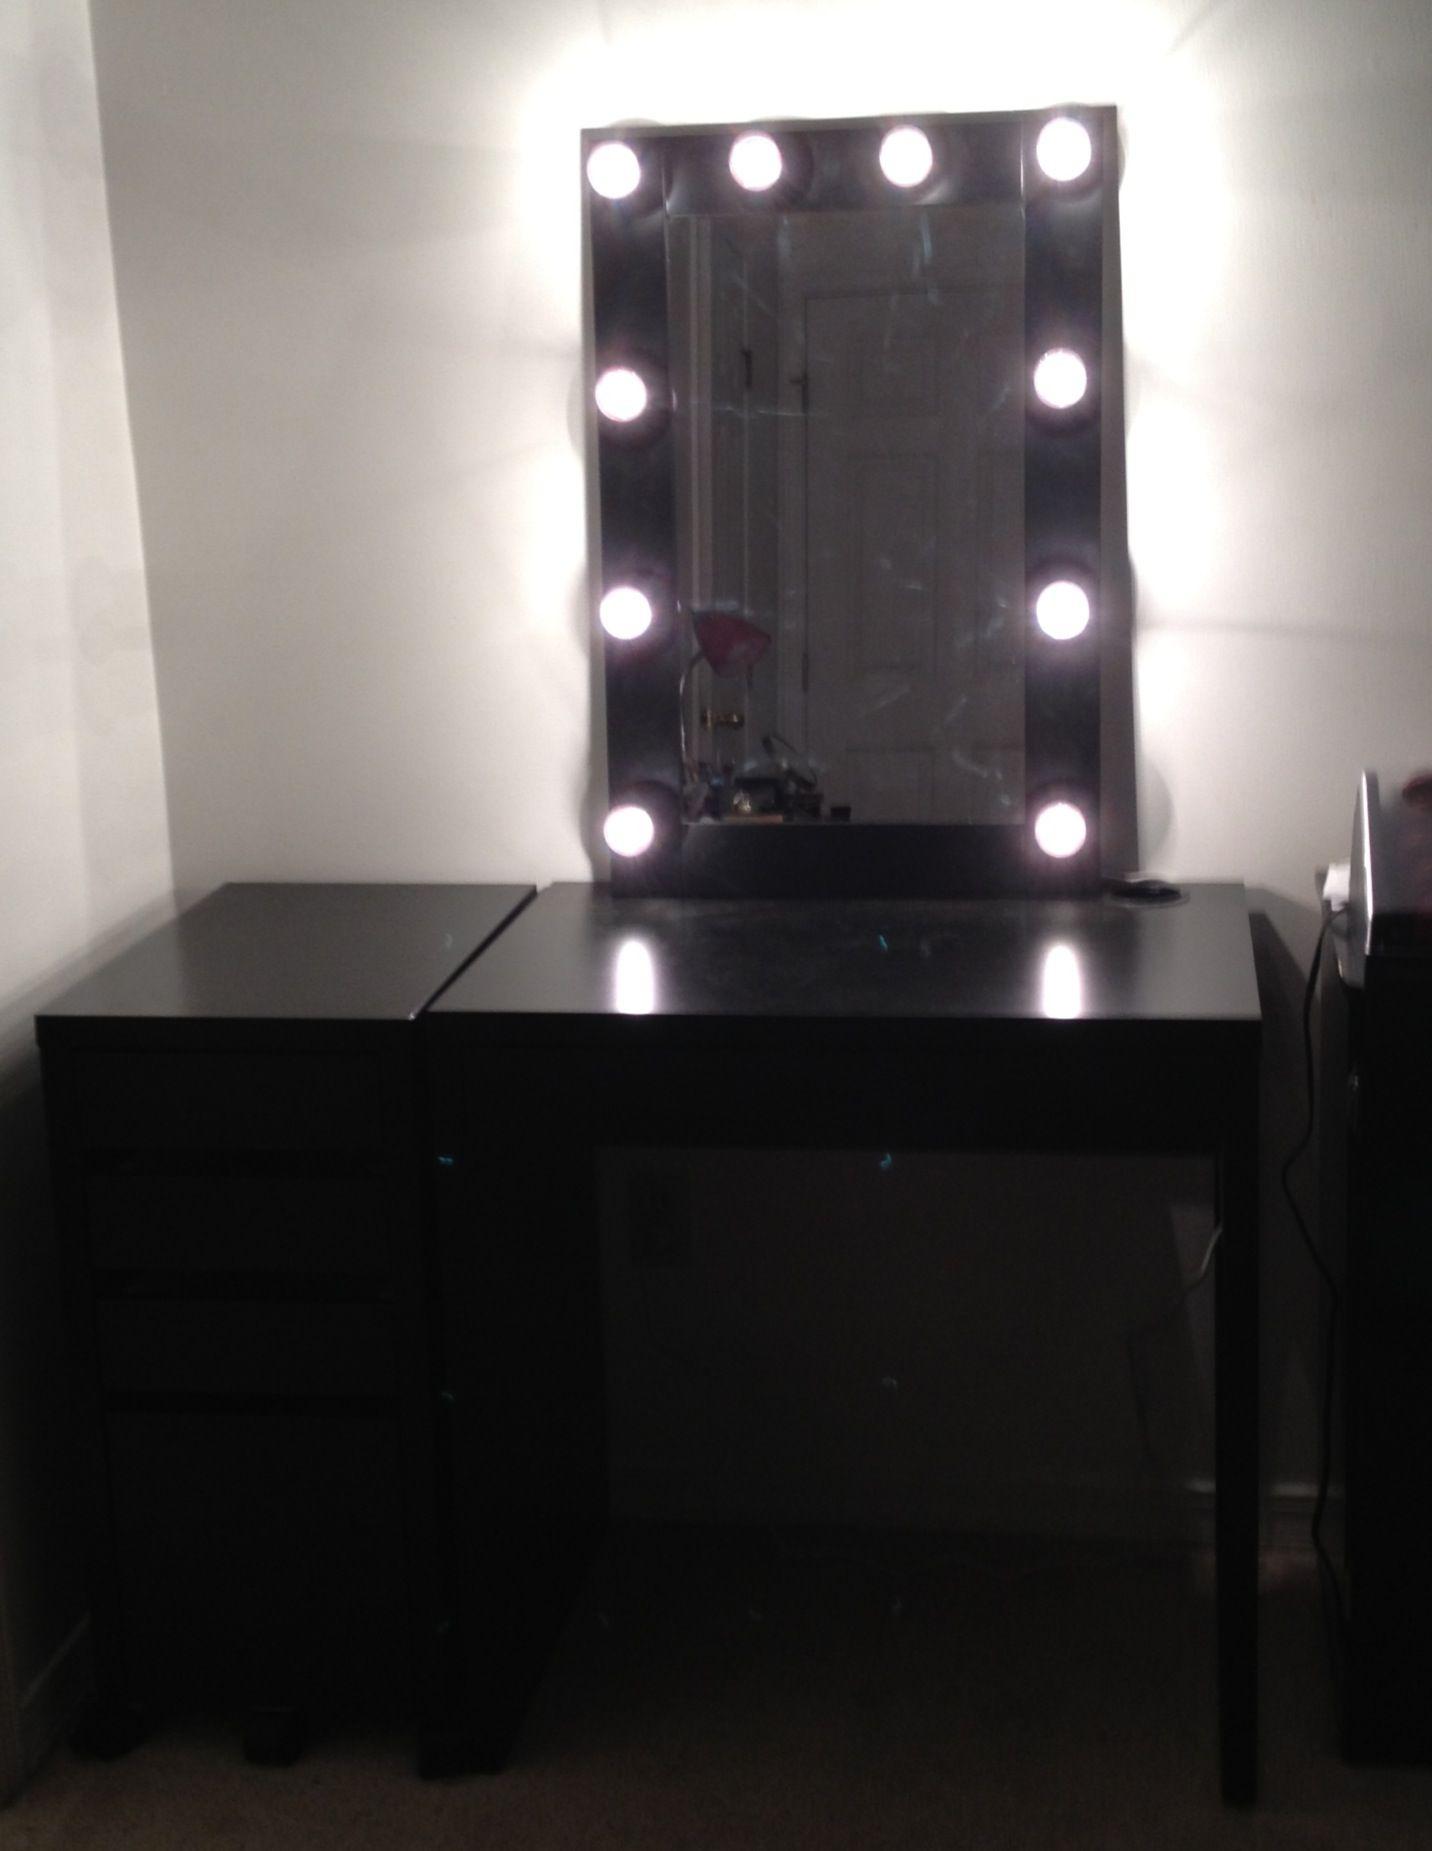 diy lighted makeup vanity. my DIY lighted makeup mirror  vanity 350 compared to vanitygirlhollywood s at